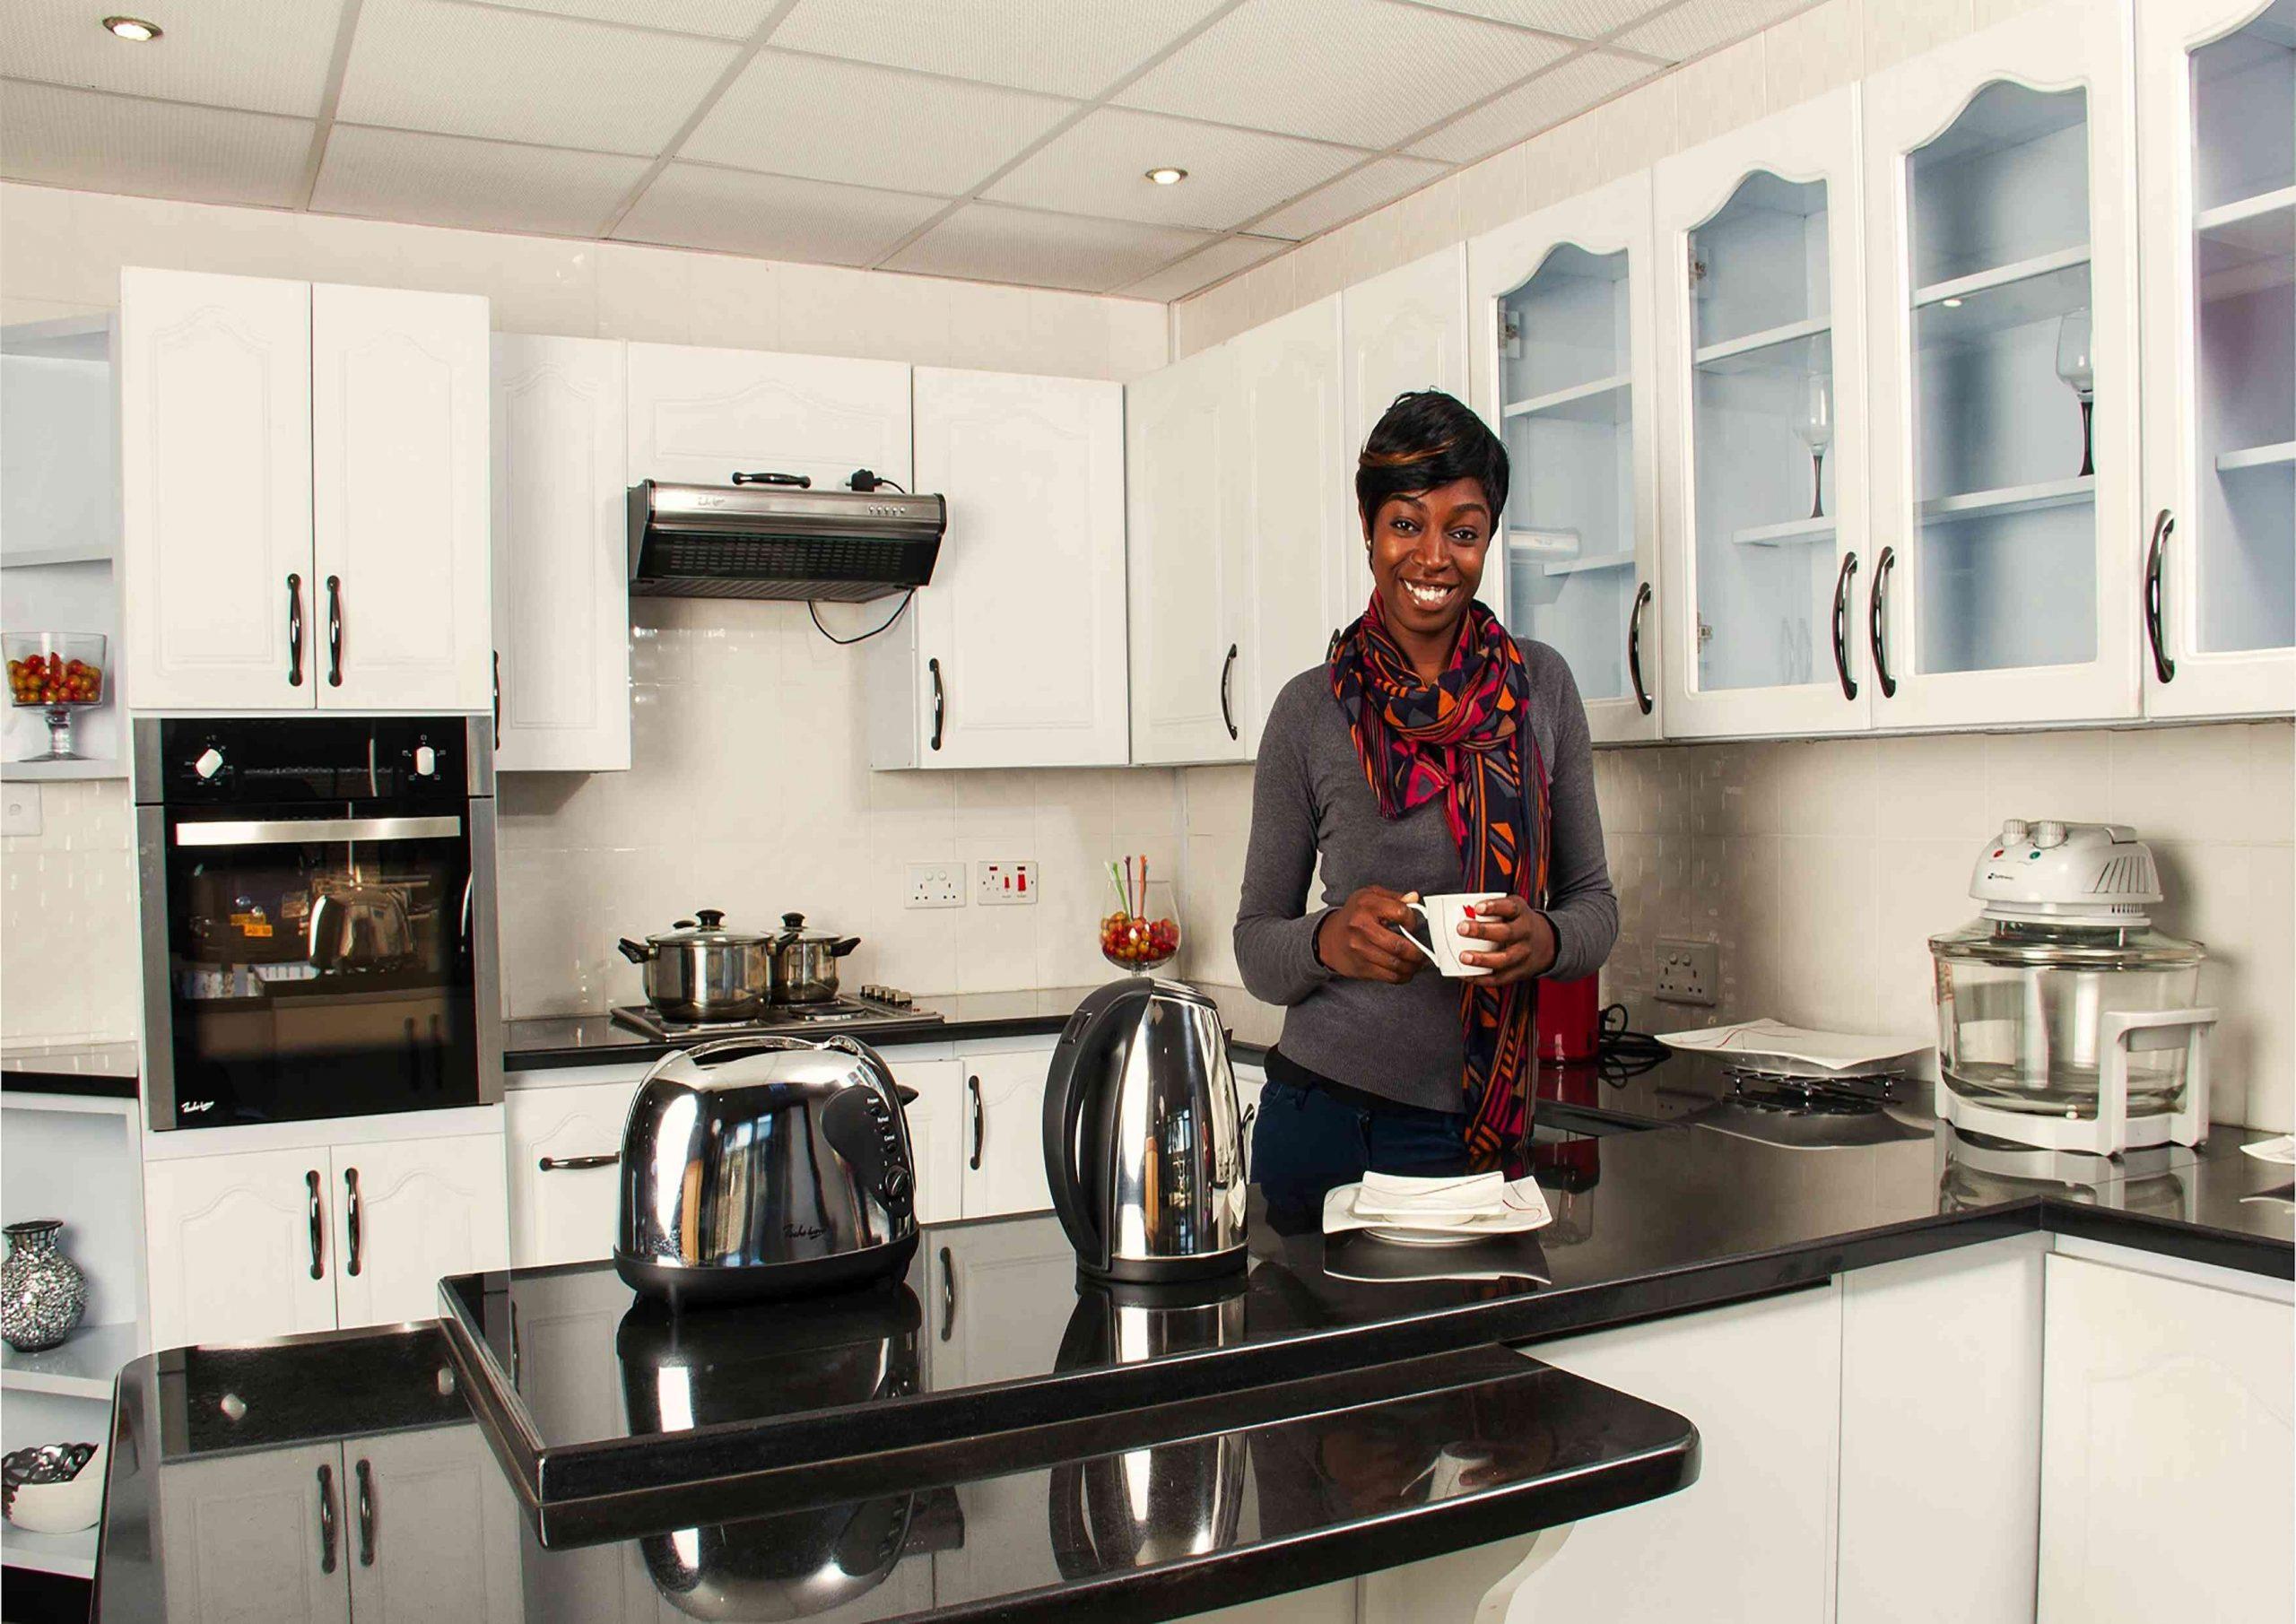 monarch kitchen and bath design